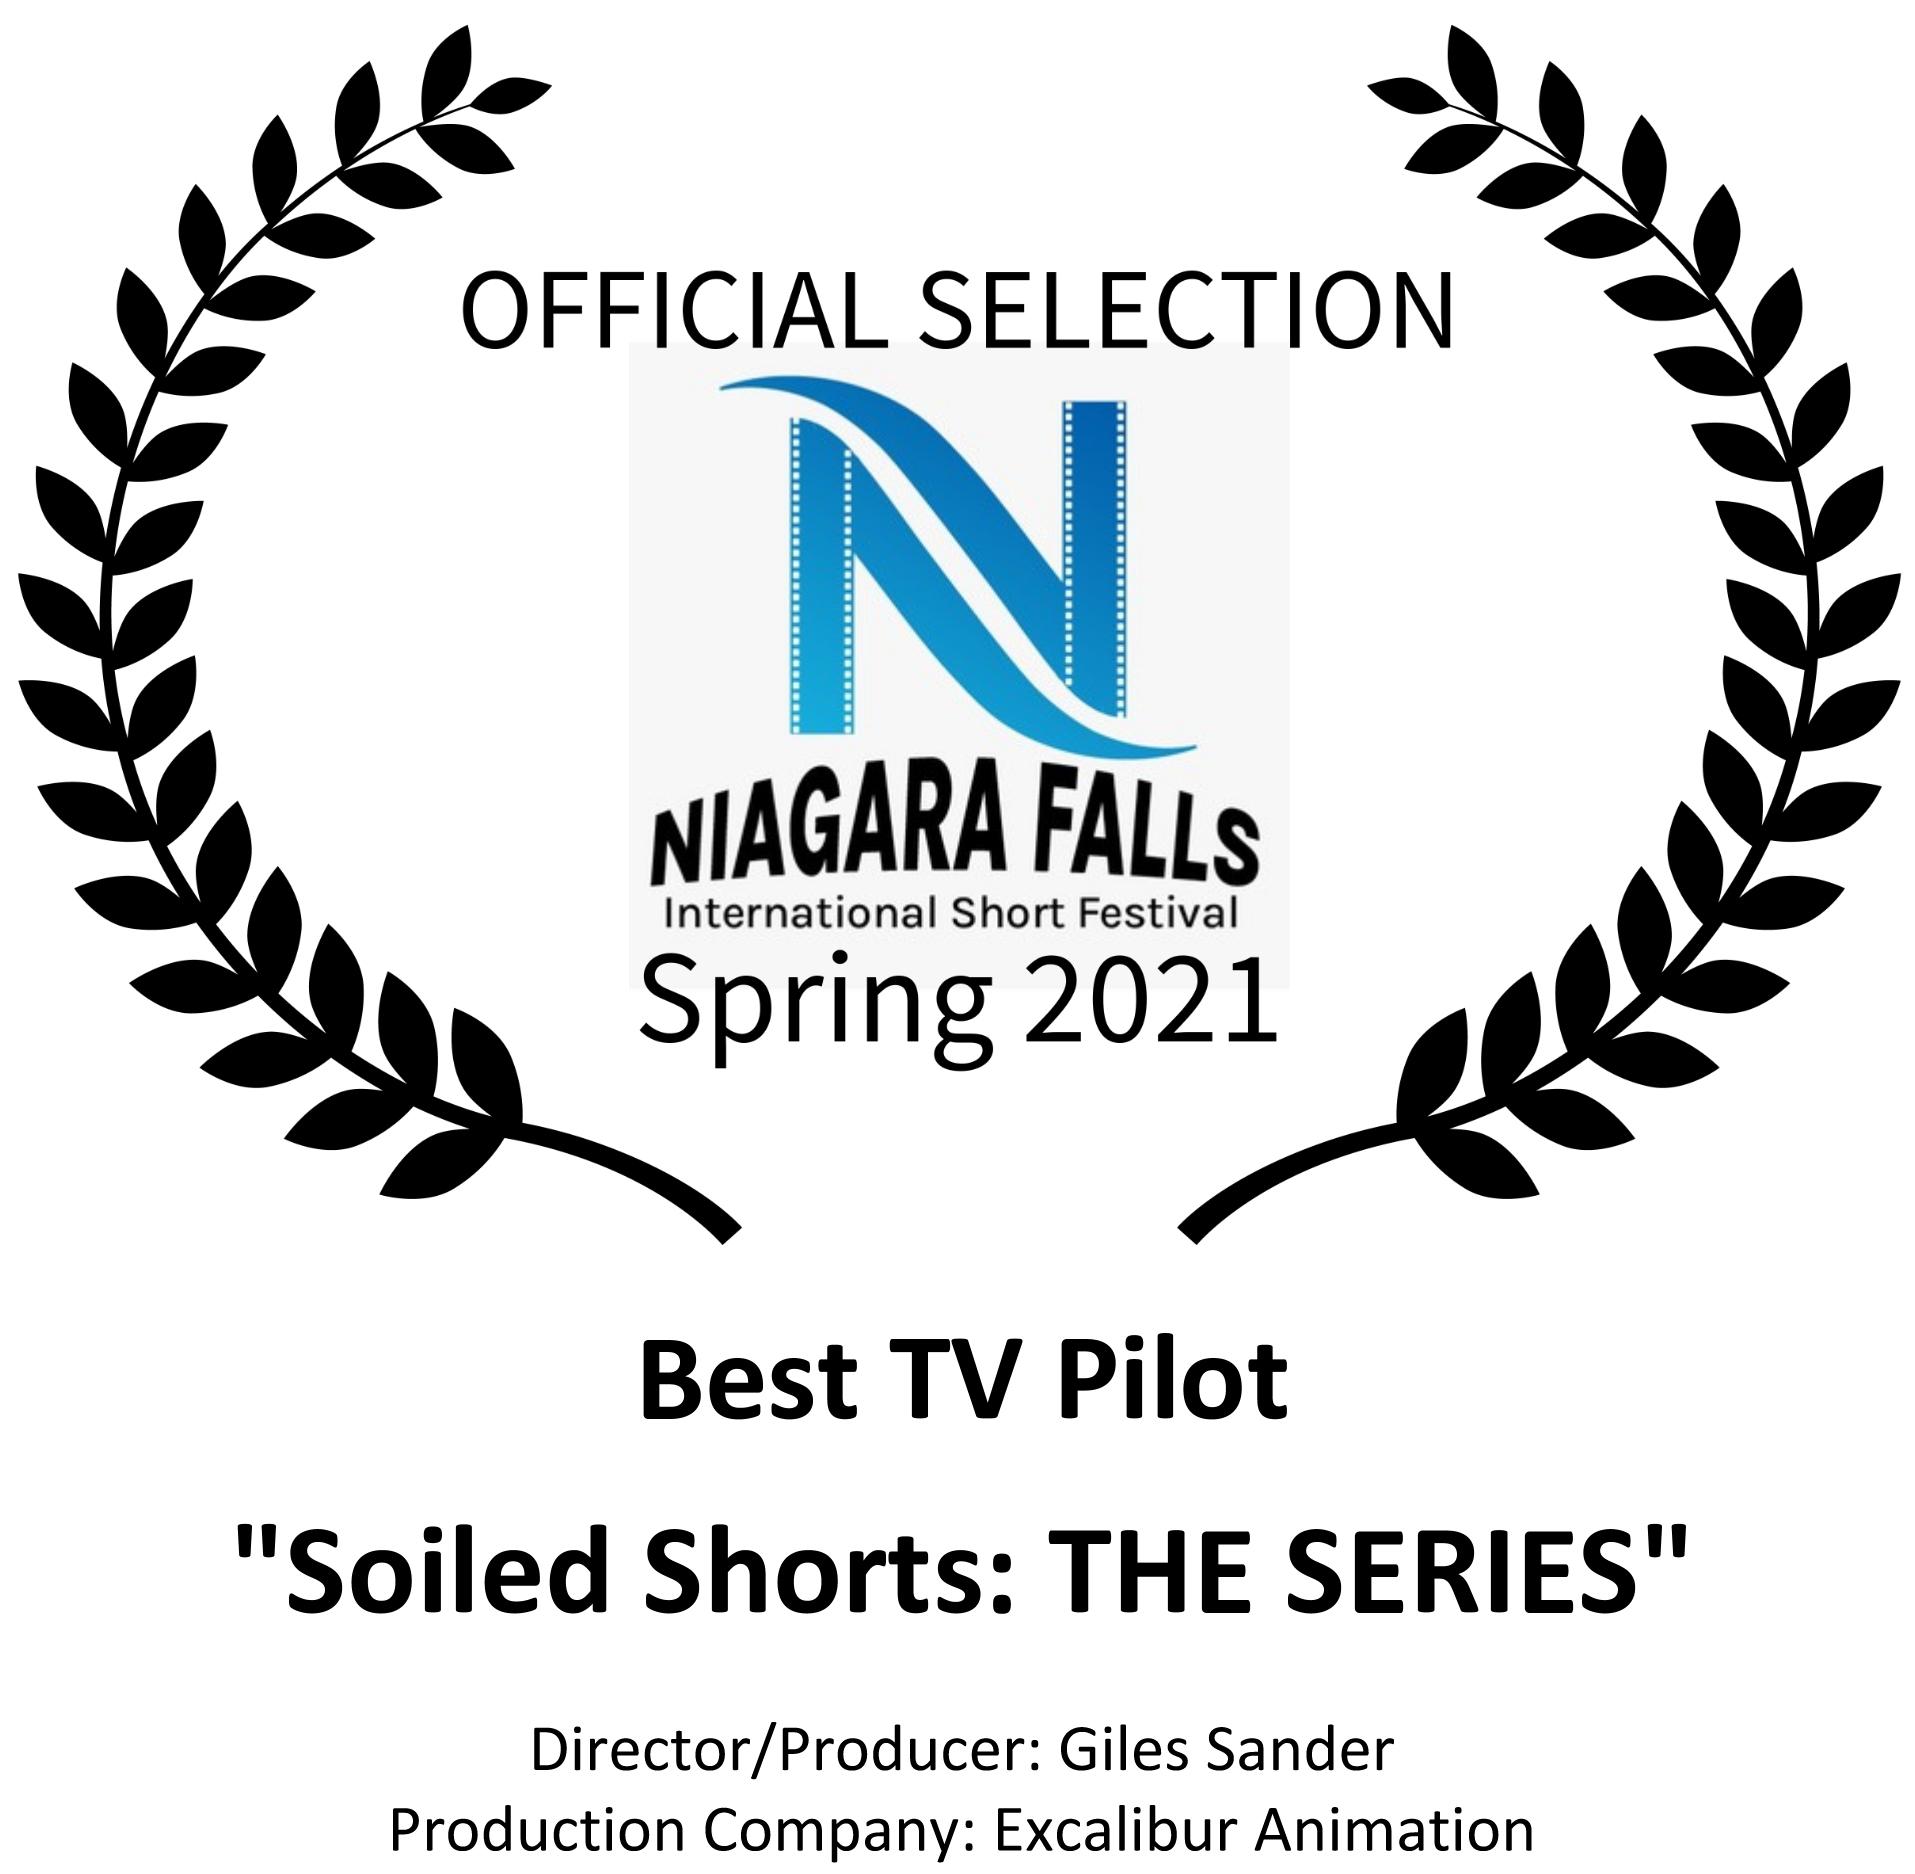 Official Selection - Niagara Falls International Short Festival 2021